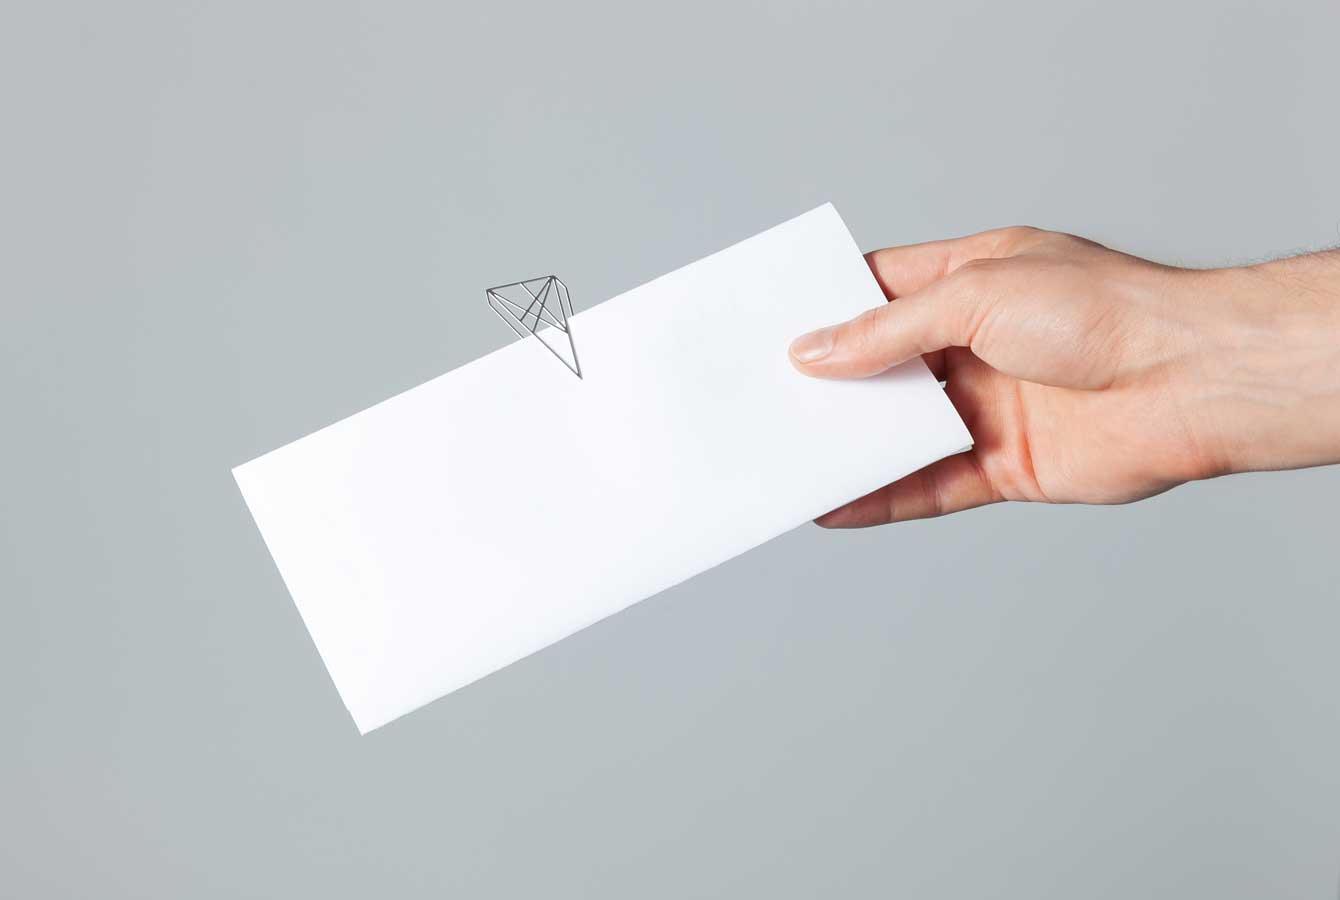 monad-paperclip